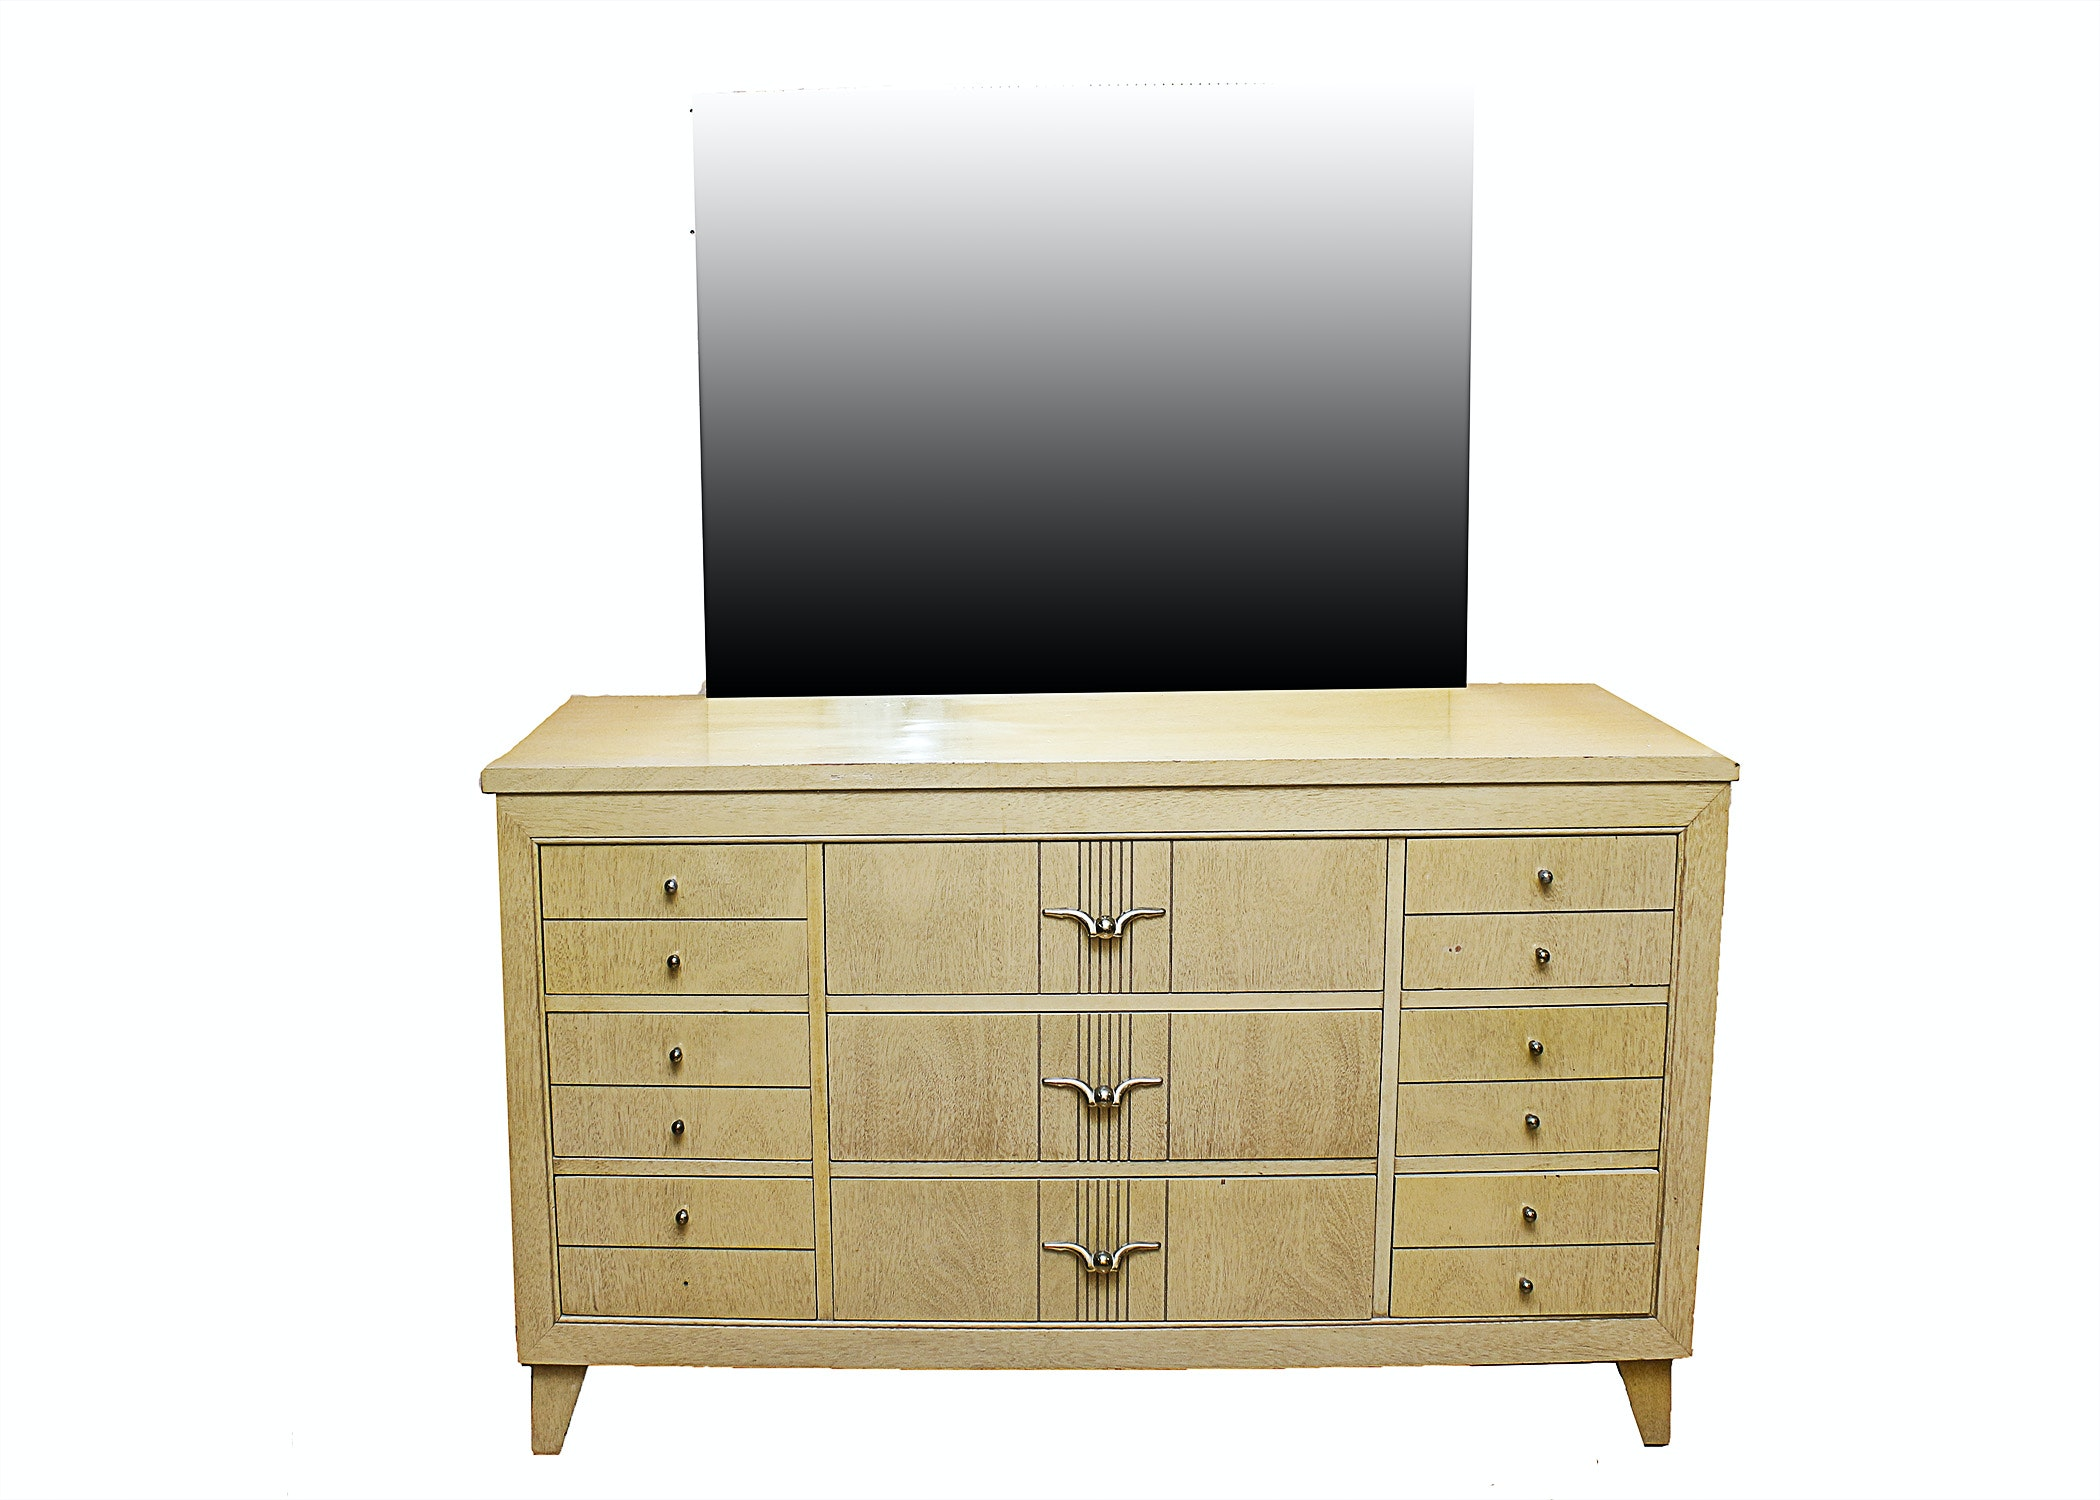 L A Period Furniture C 1950s Mid Century Dresser And